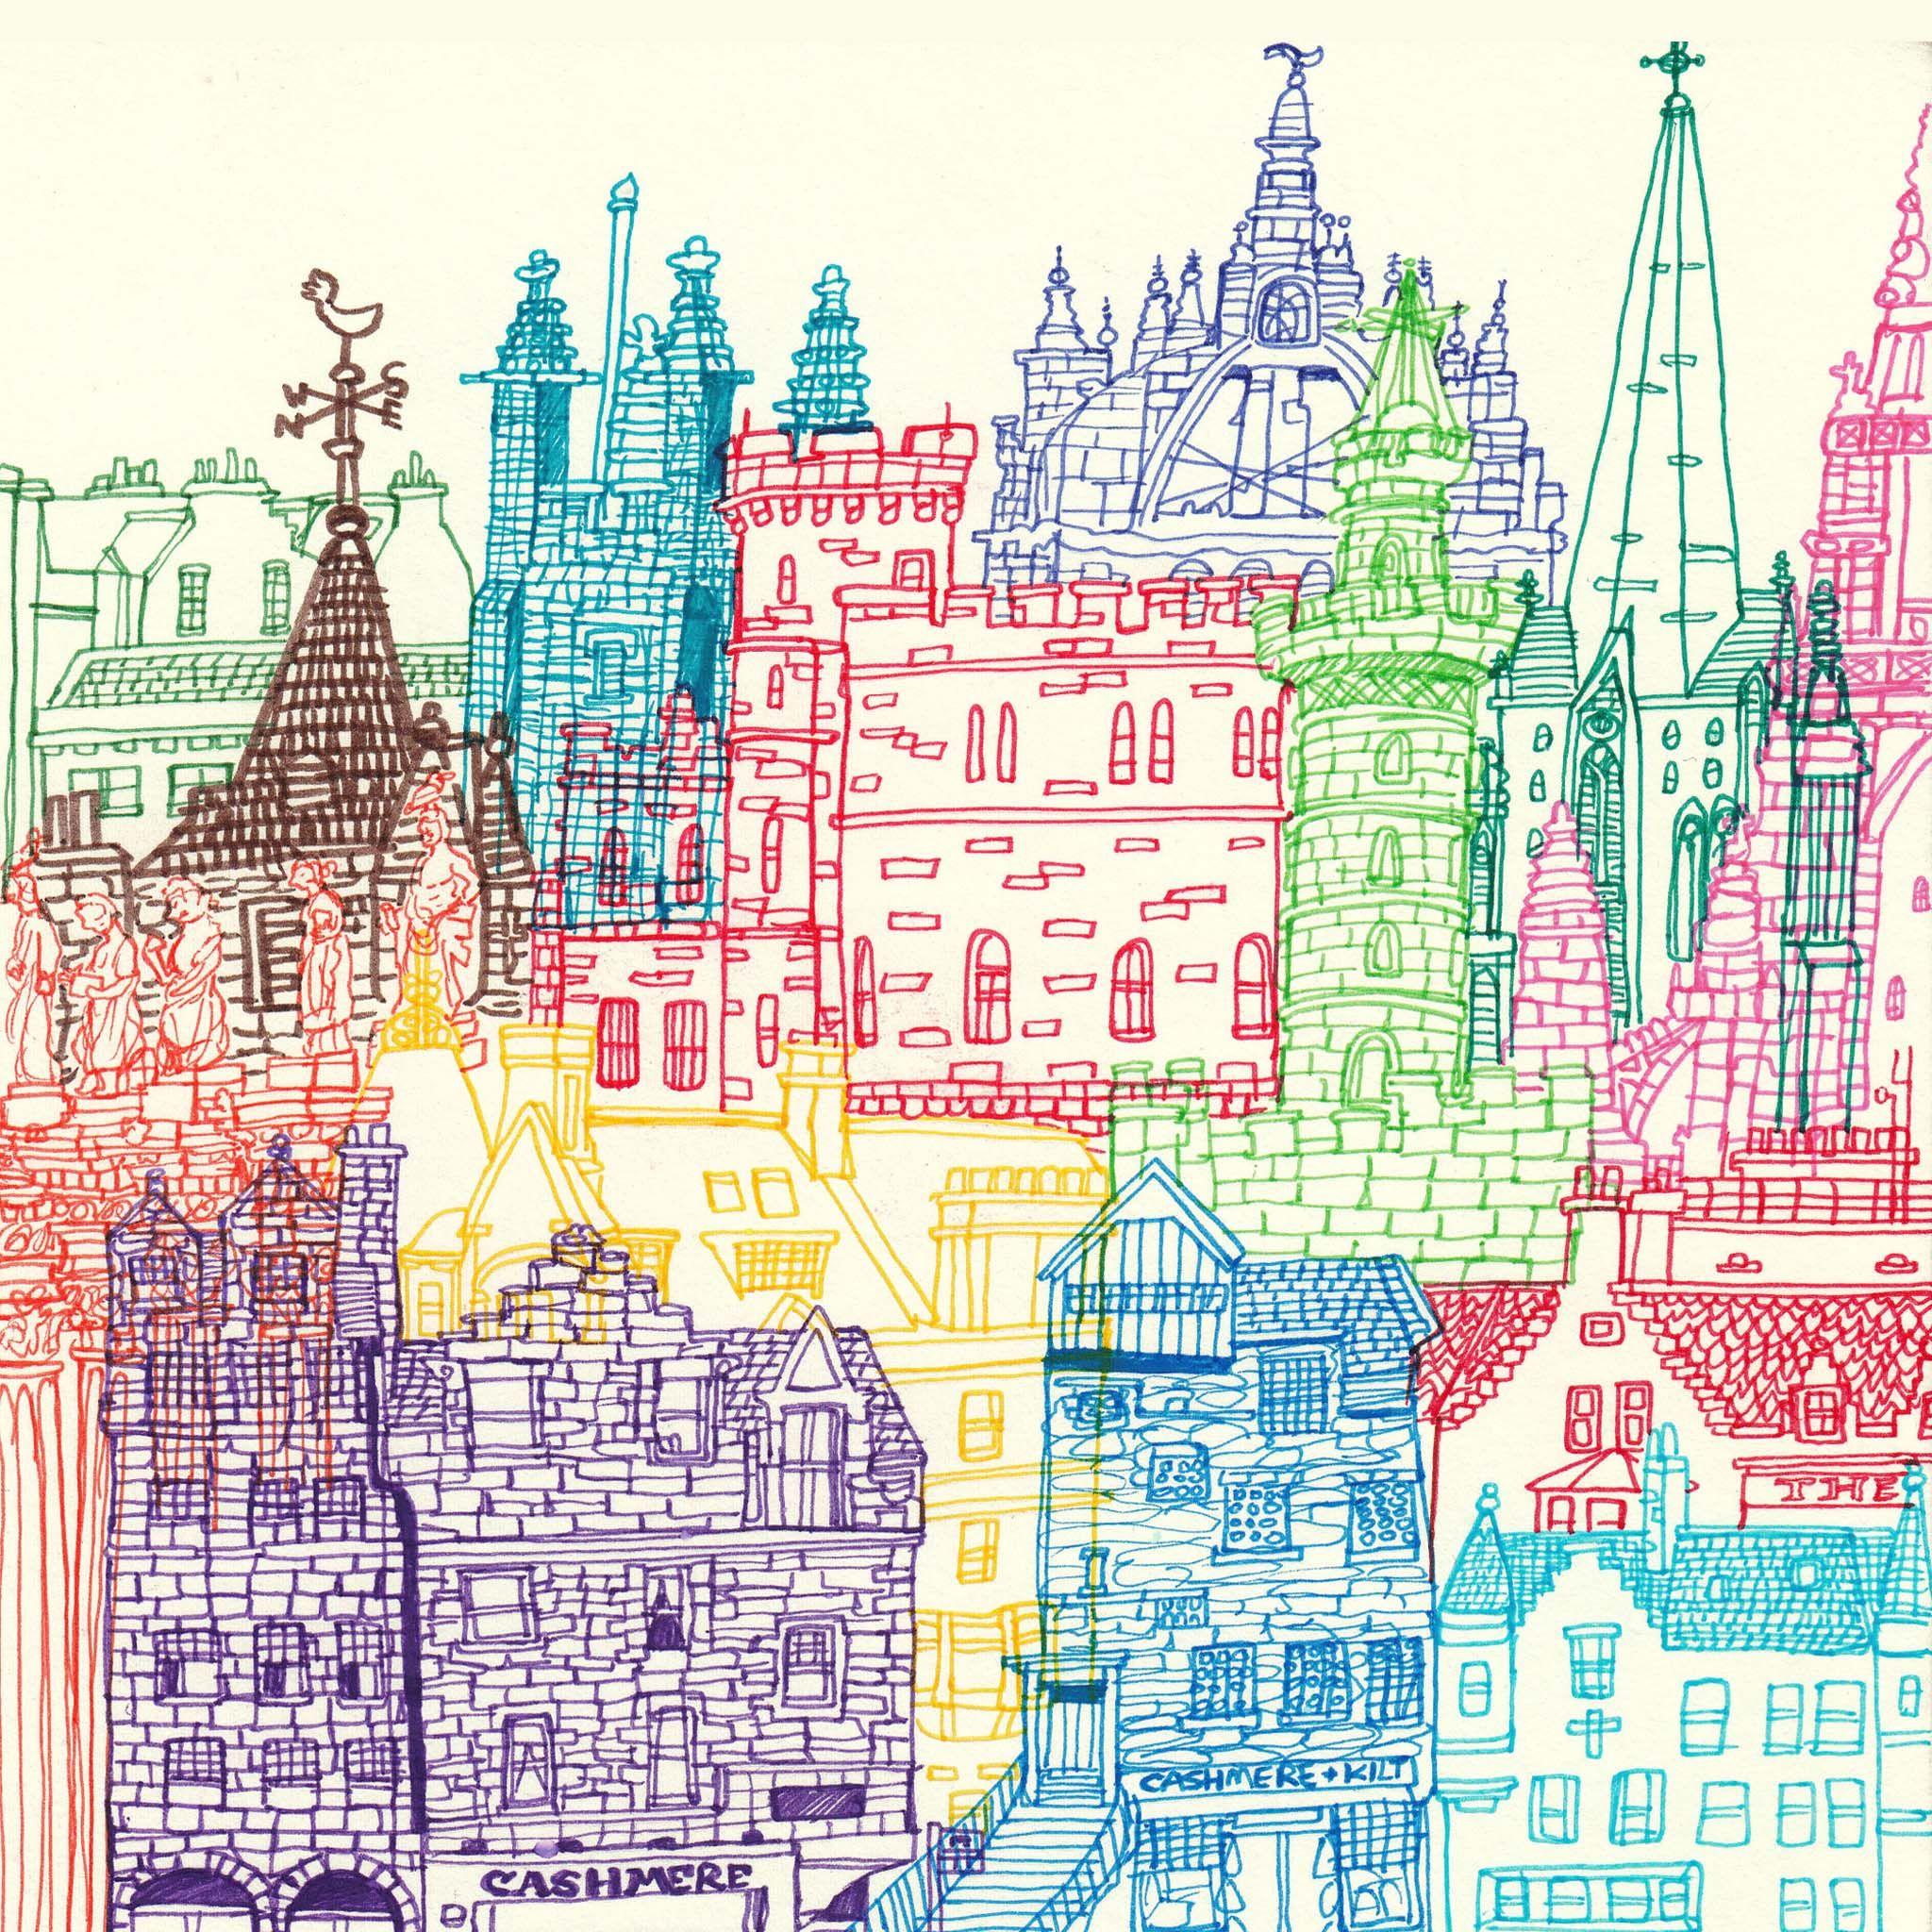 Hd wallpaper pinterest - Edinburgh Towers Ipad Wallpaper Hd